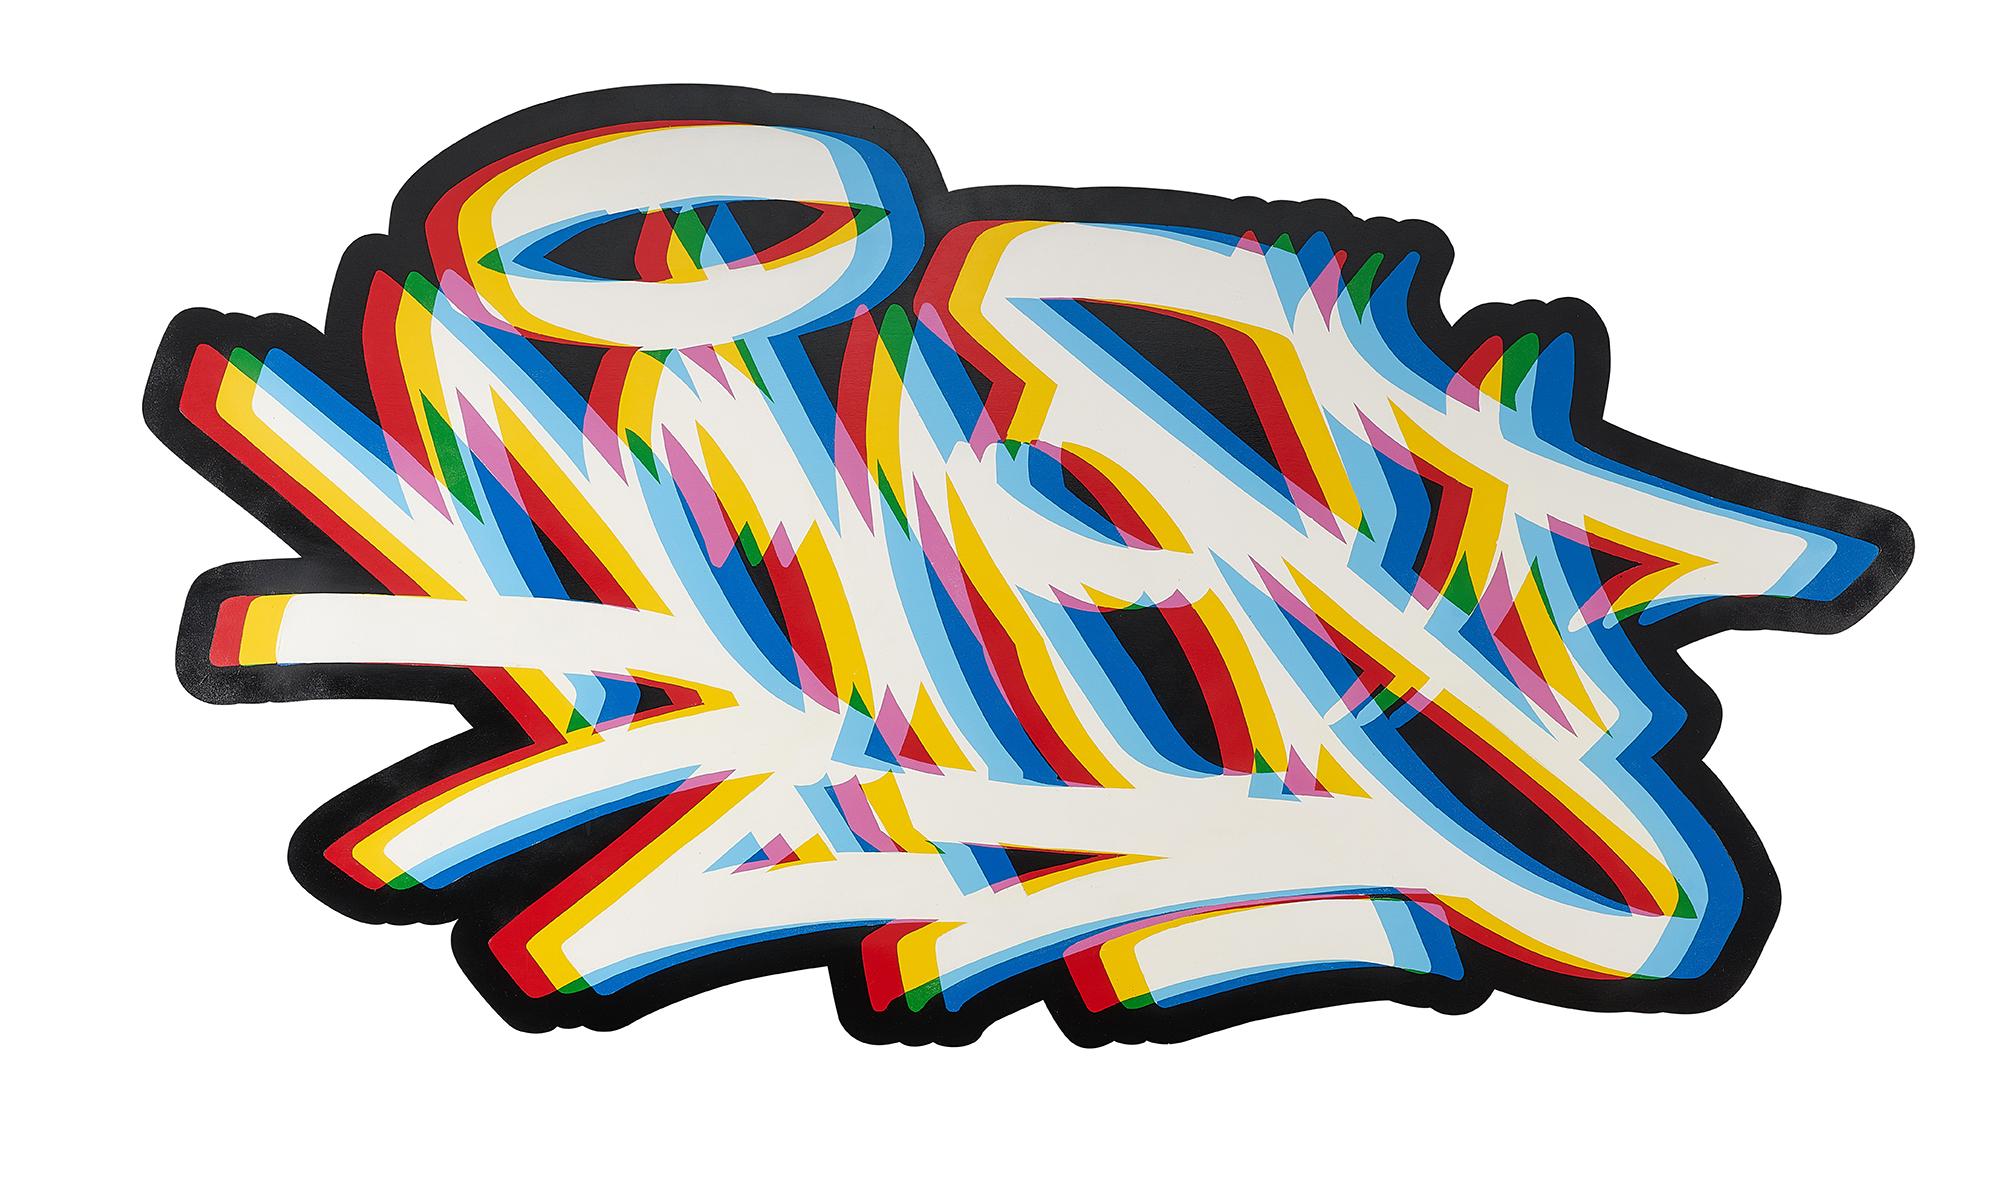 'Aches_01', 2019, Spray Paint on Wood, 100 x 700 cm, The Hendrick.